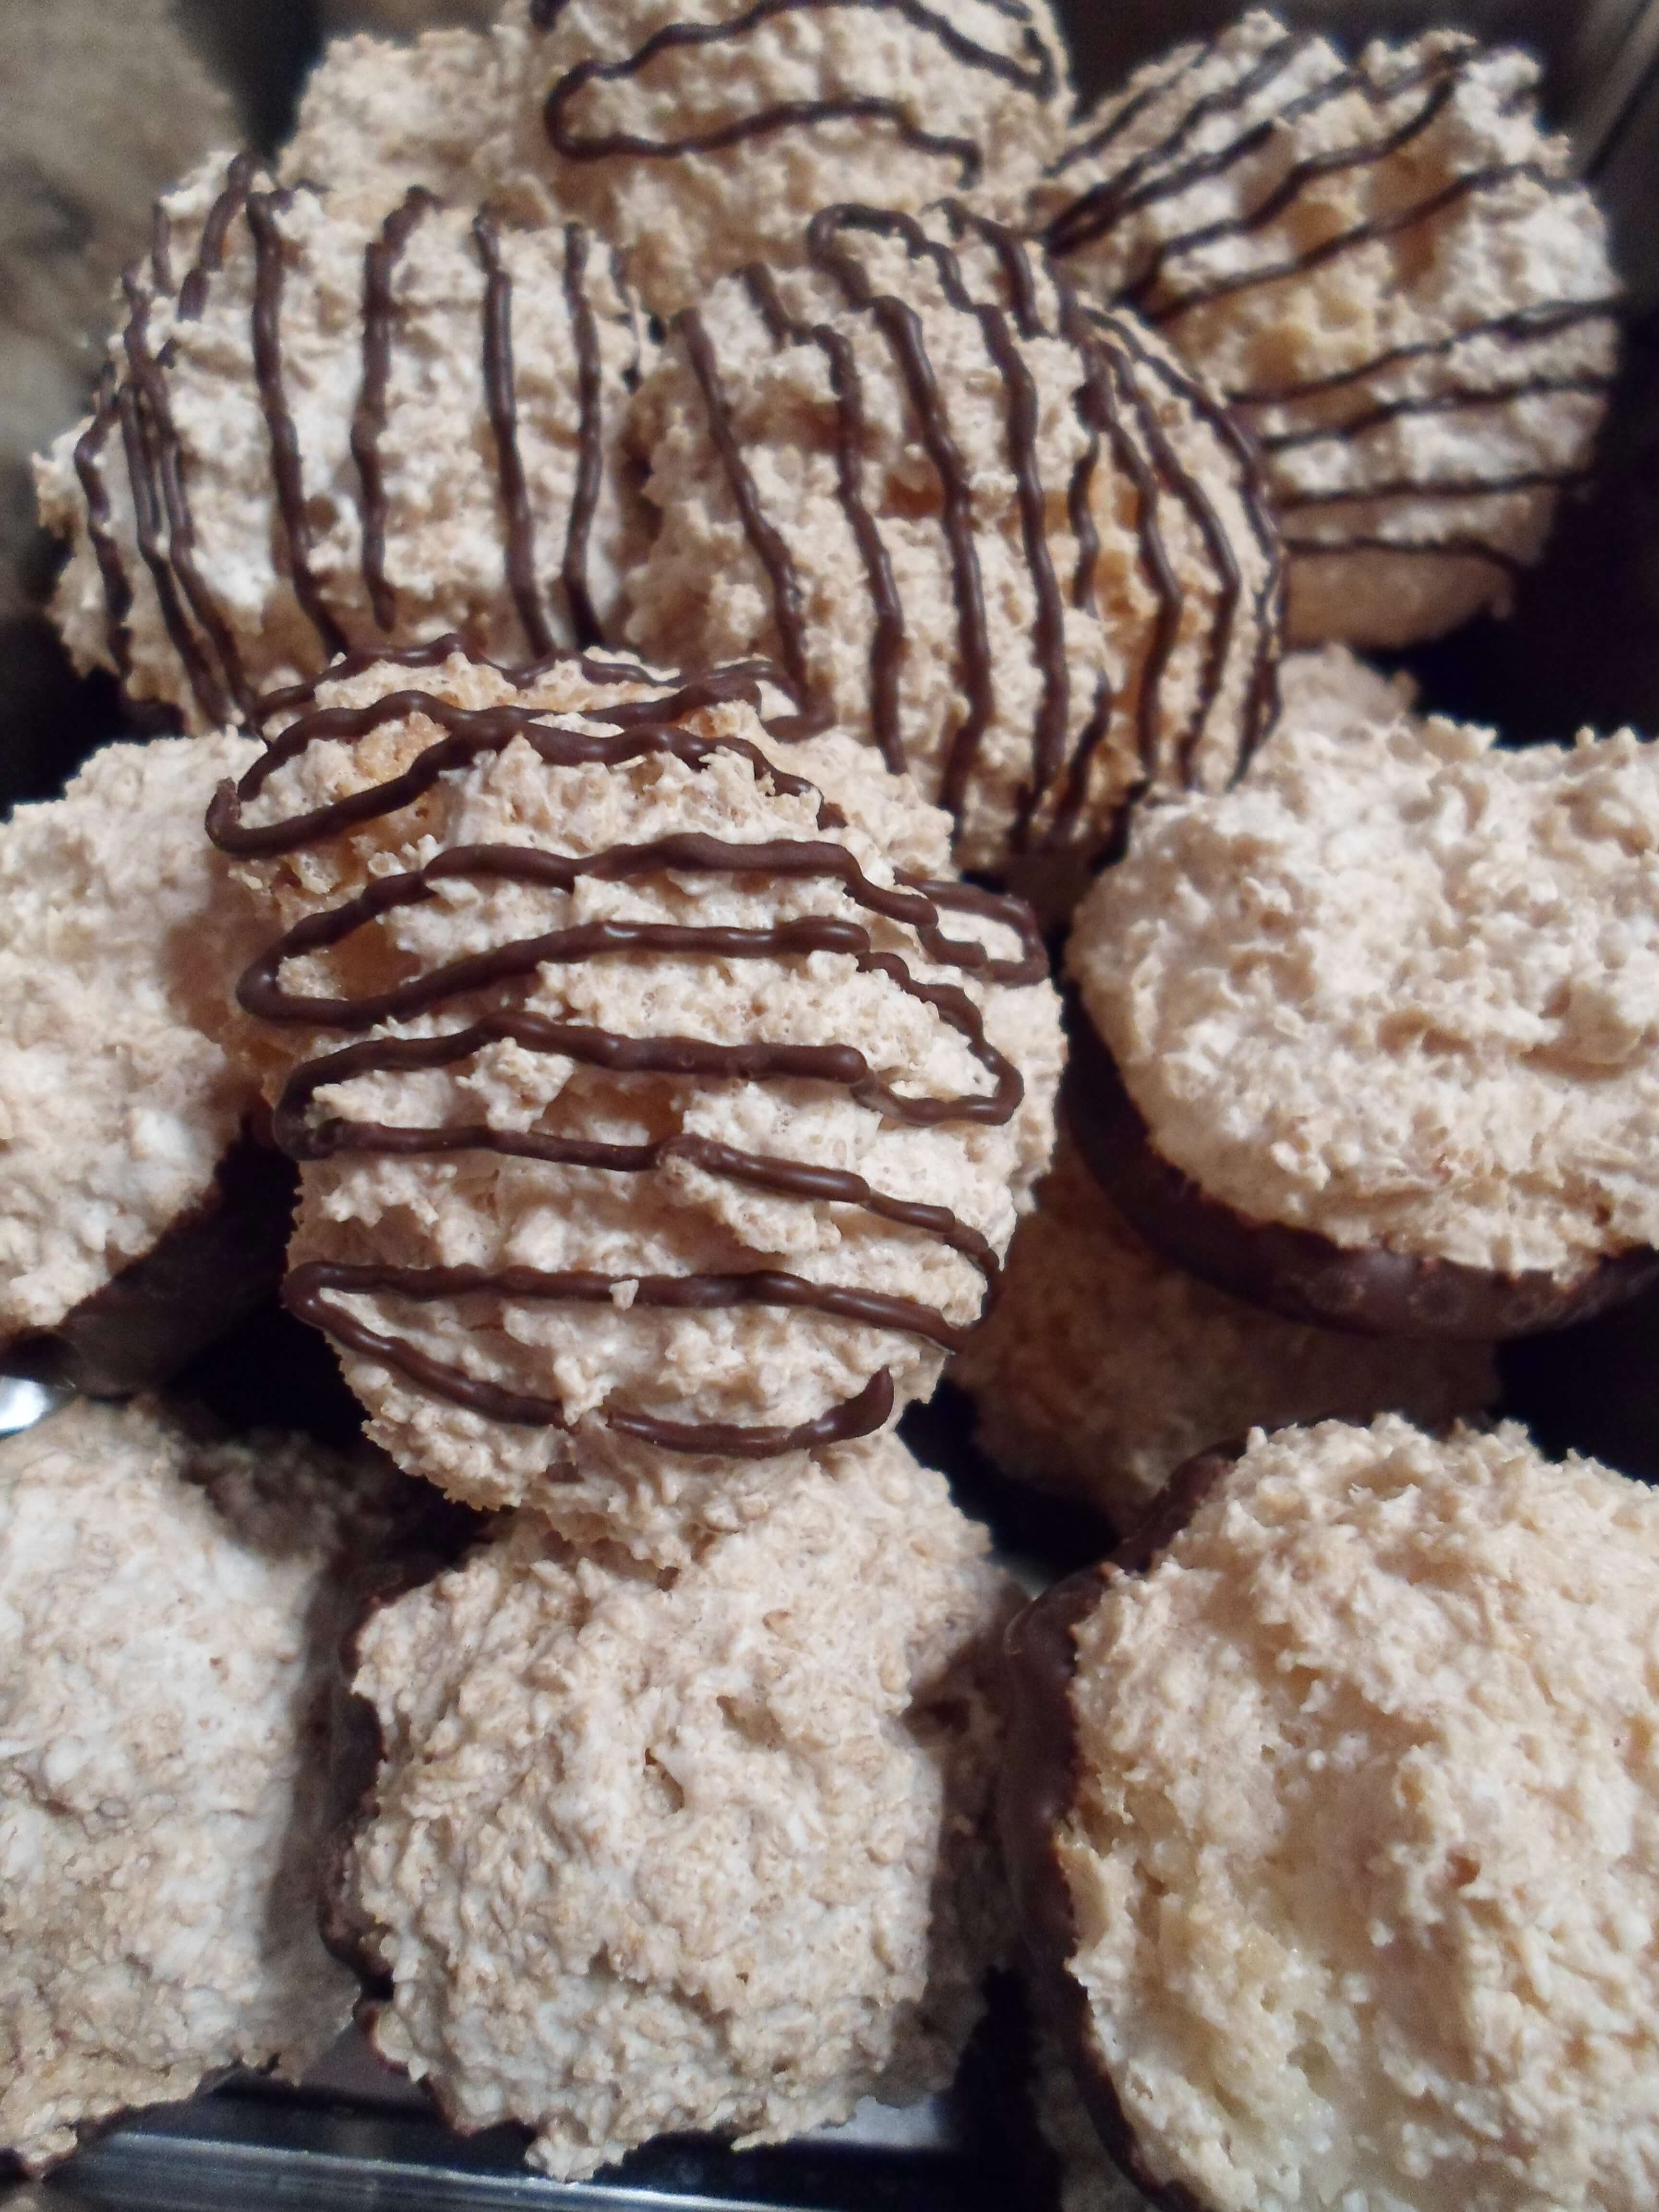 low carb kokosmakronen leckeres rezept f r kohlenhydratarme kekse. Black Bedroom Furniture Sets. Home Design Ideas